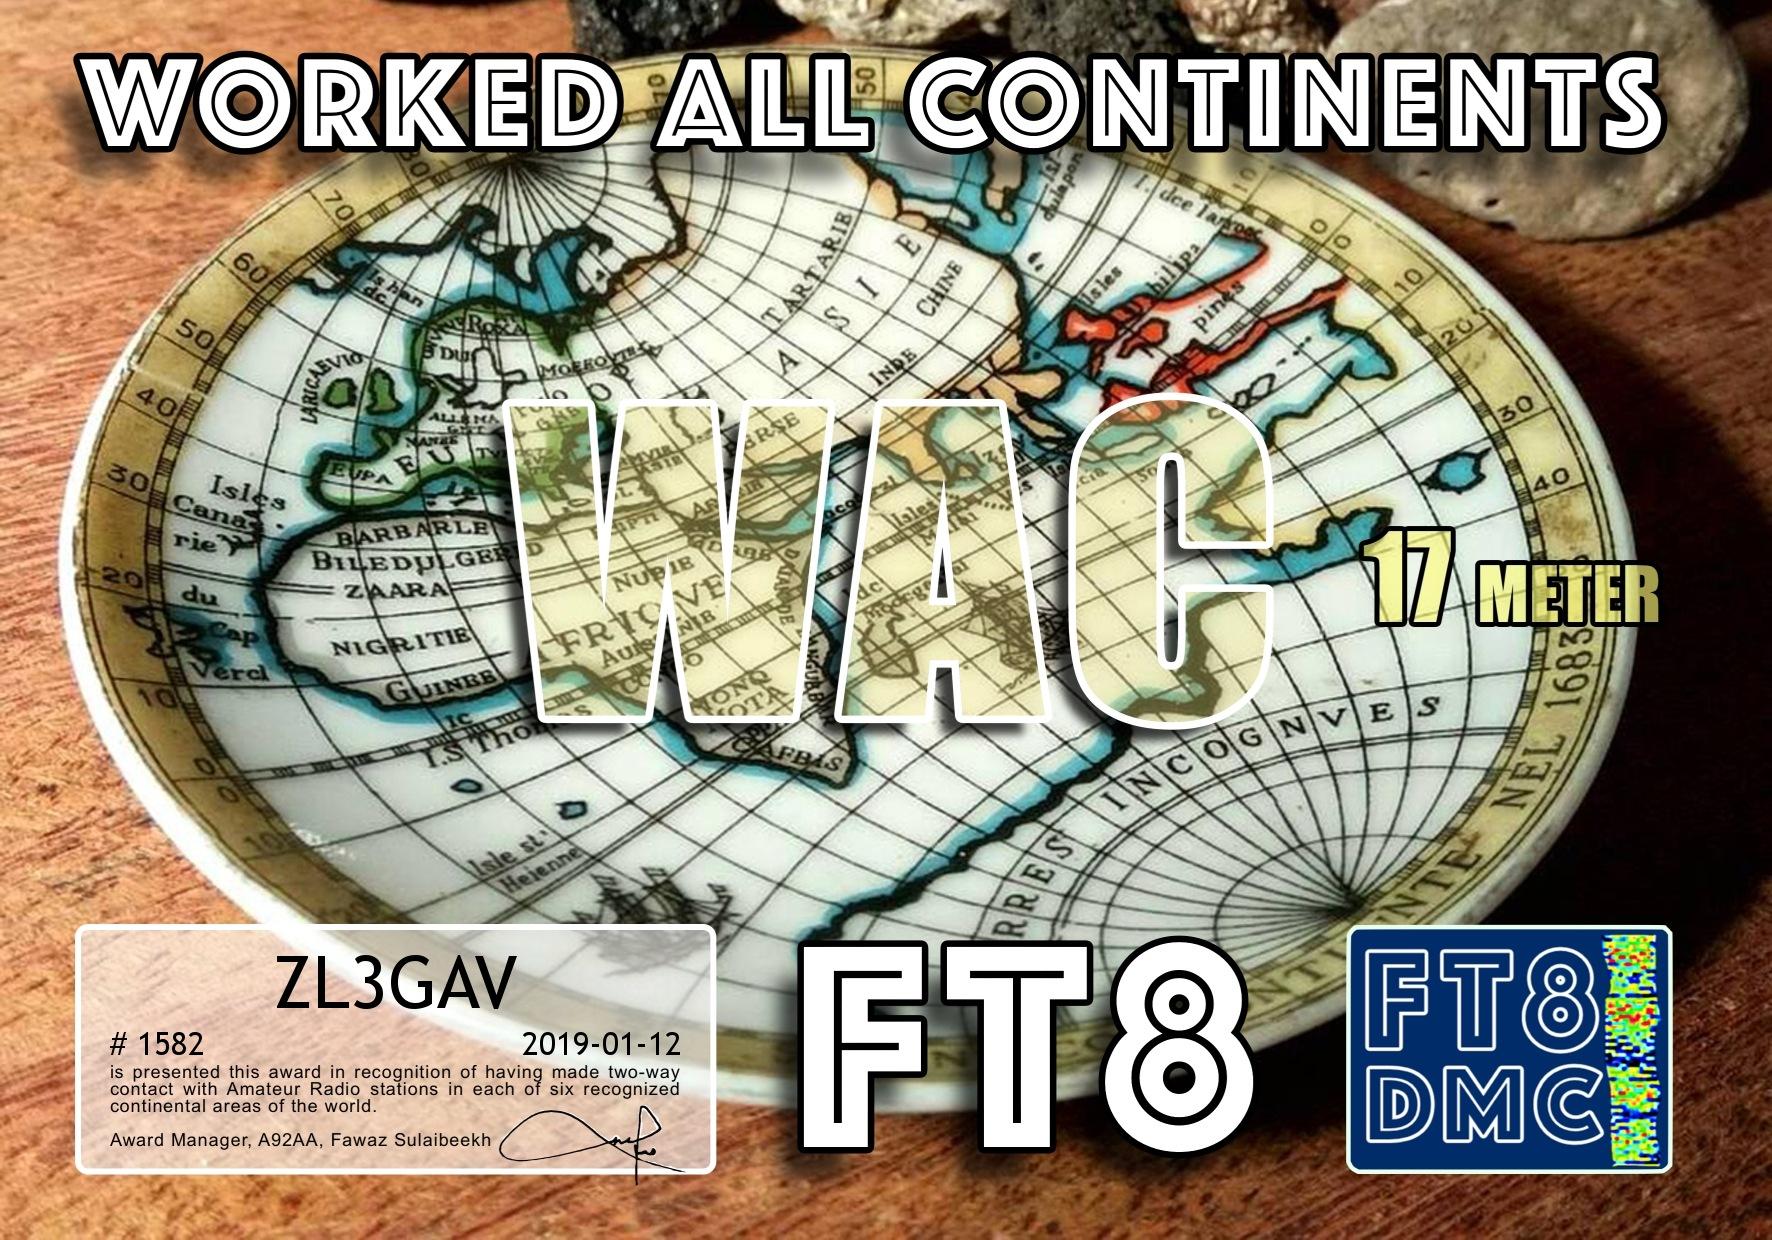 ZL3GAV-WAC-17M.jpg